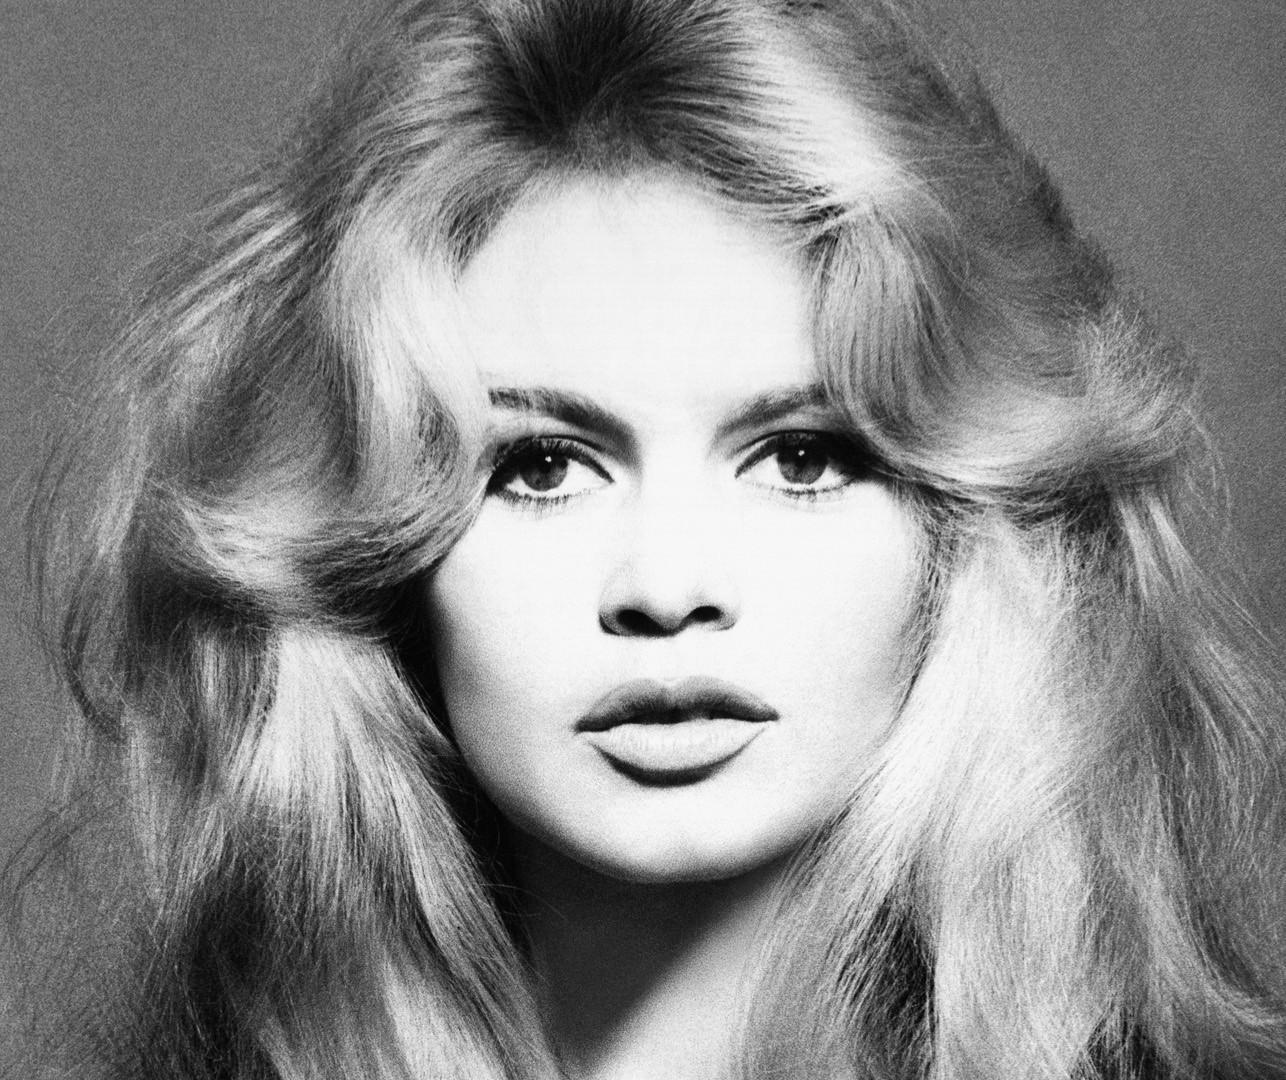 Richard Avedon, Brigitte Bardot, actress, hair by Alexandre, Paris, January 1959